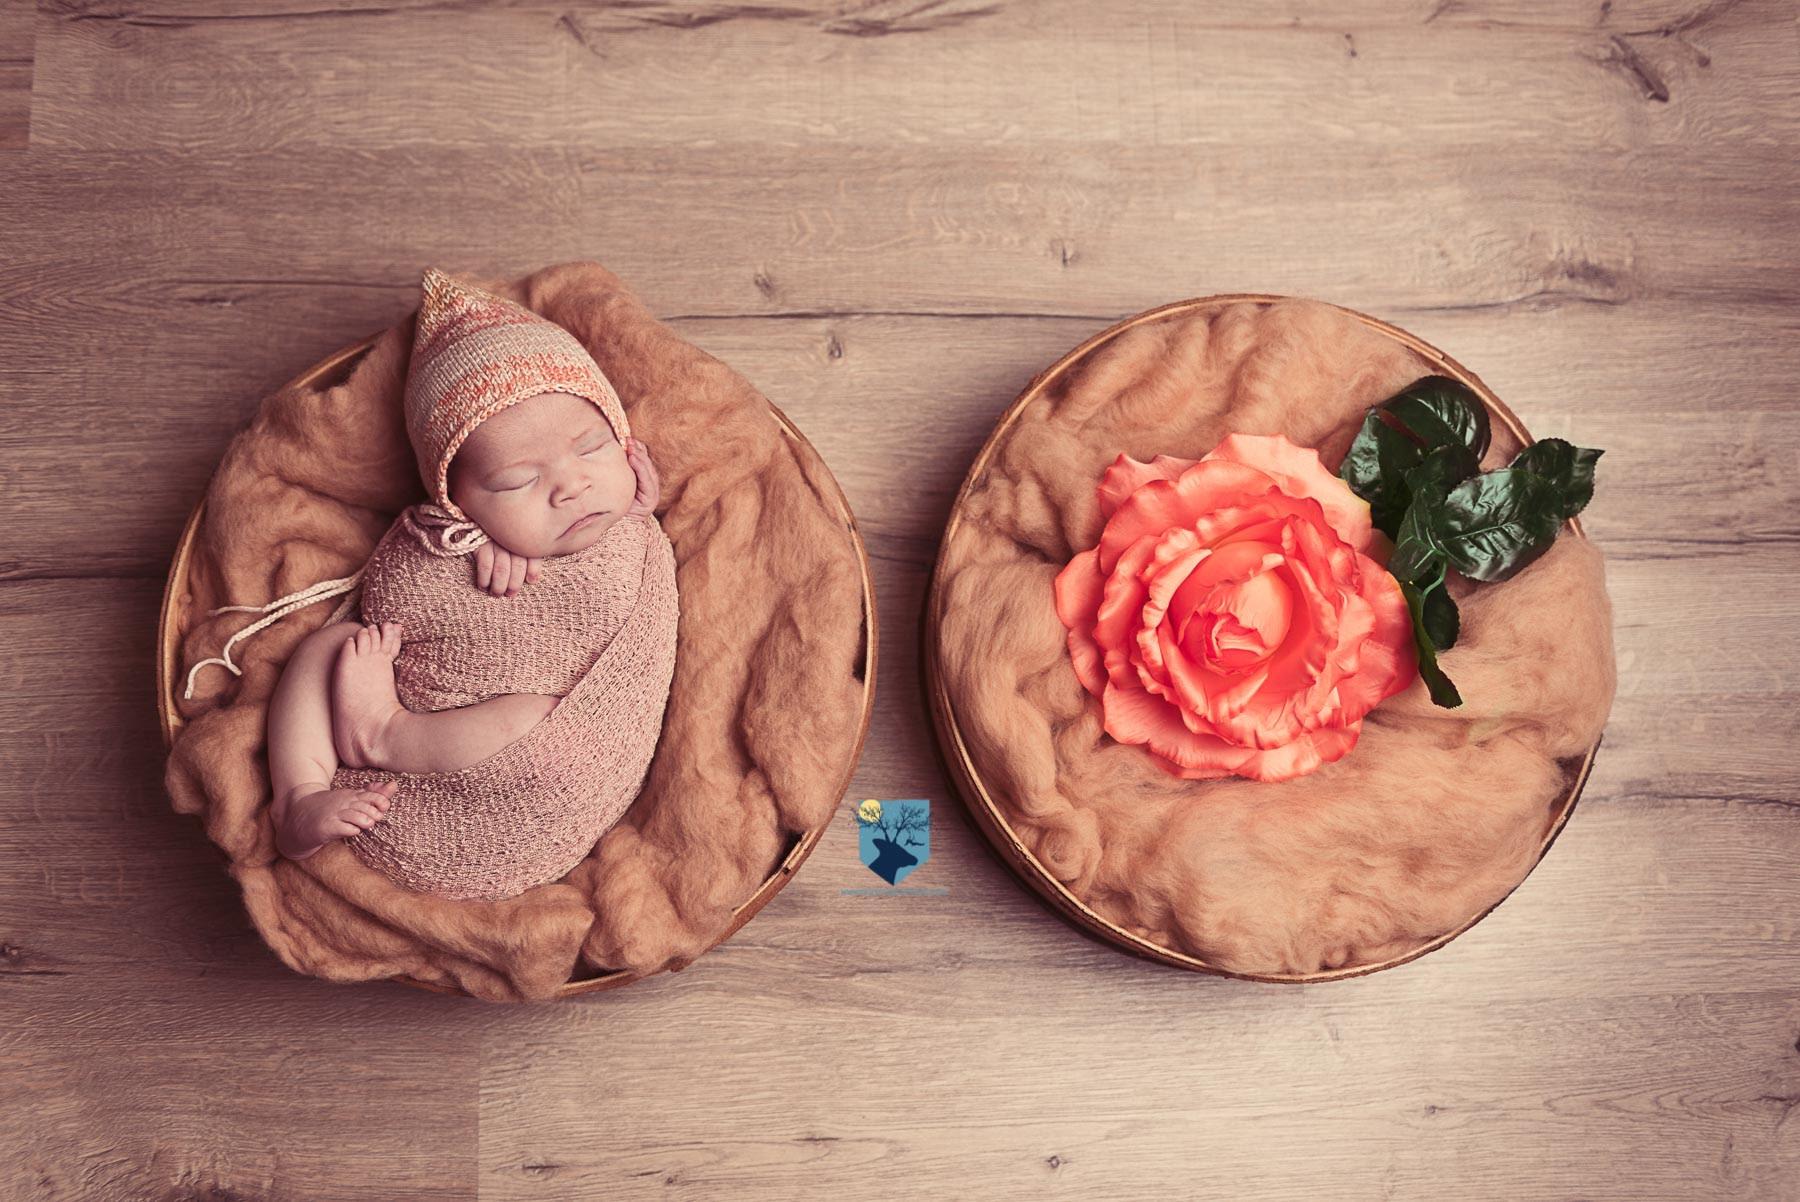 fotografia,girona,figueres,emporda,monica quintana,bebes,niños,familia,retrato,recien,nacido,nado,newborn,bebe arcoiris